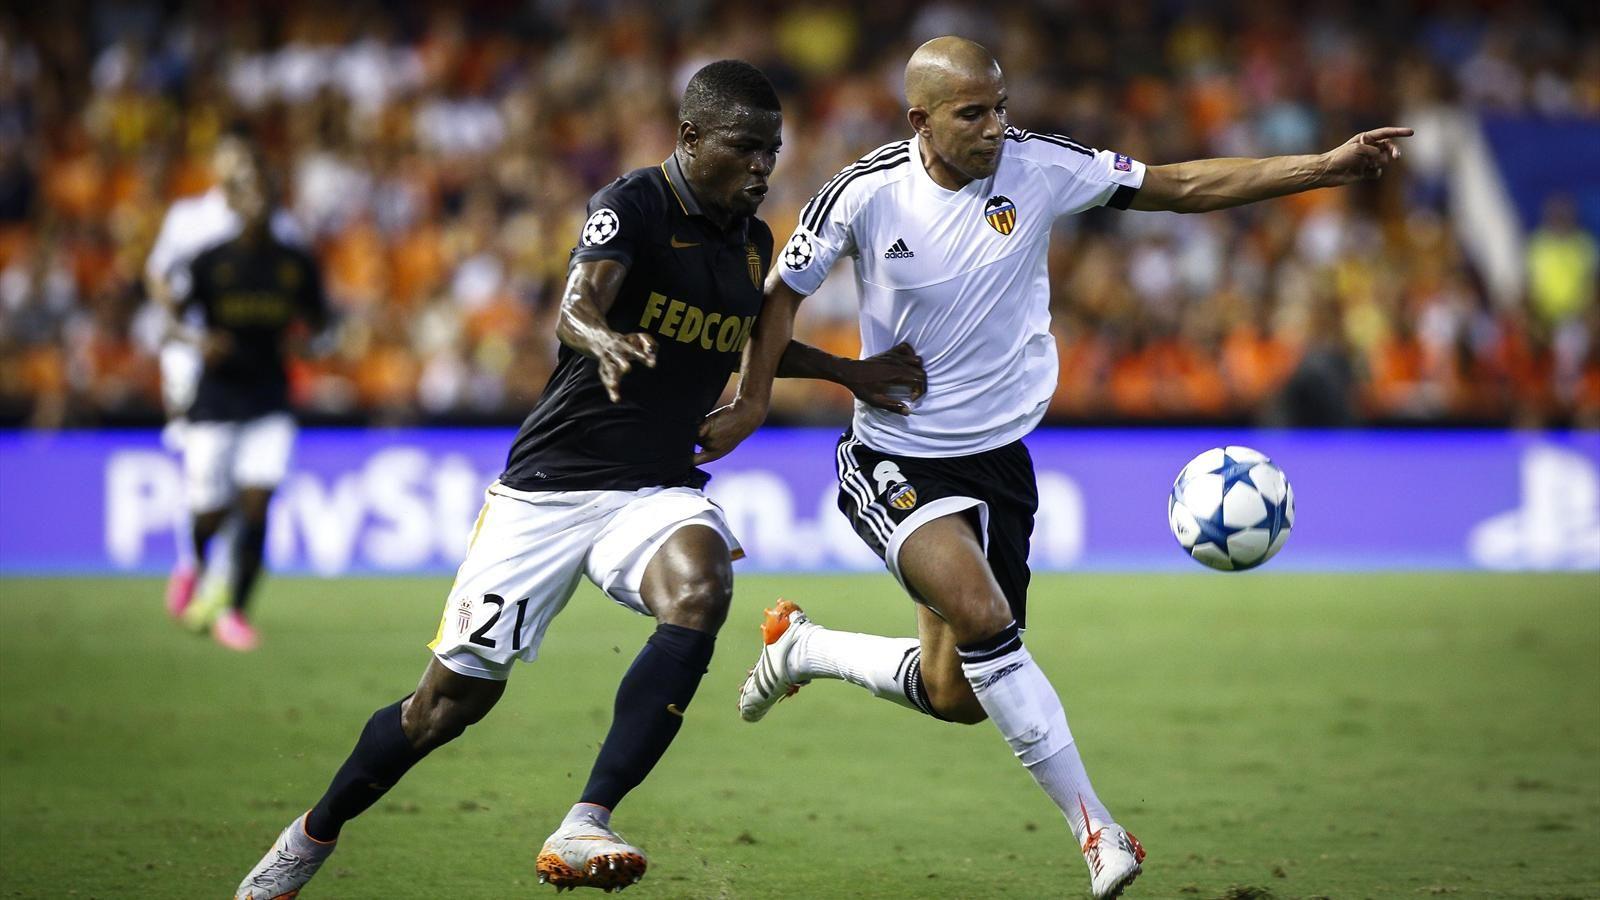 19.08.2015: Valencia CF 3 - 1 AS Monaco